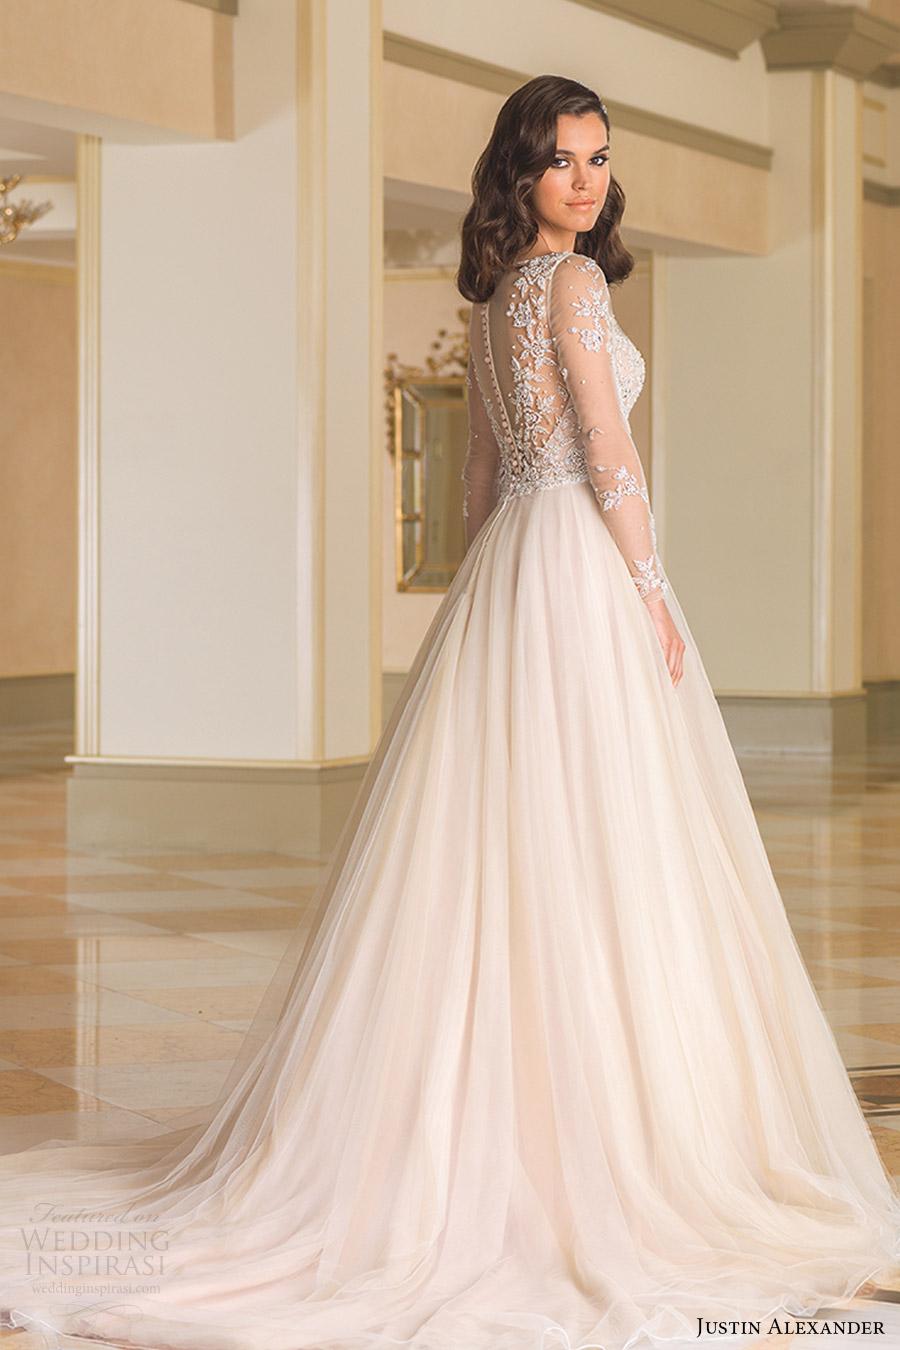 Justin Alexander Fall 2016 Wedding Dresses Inspirasi